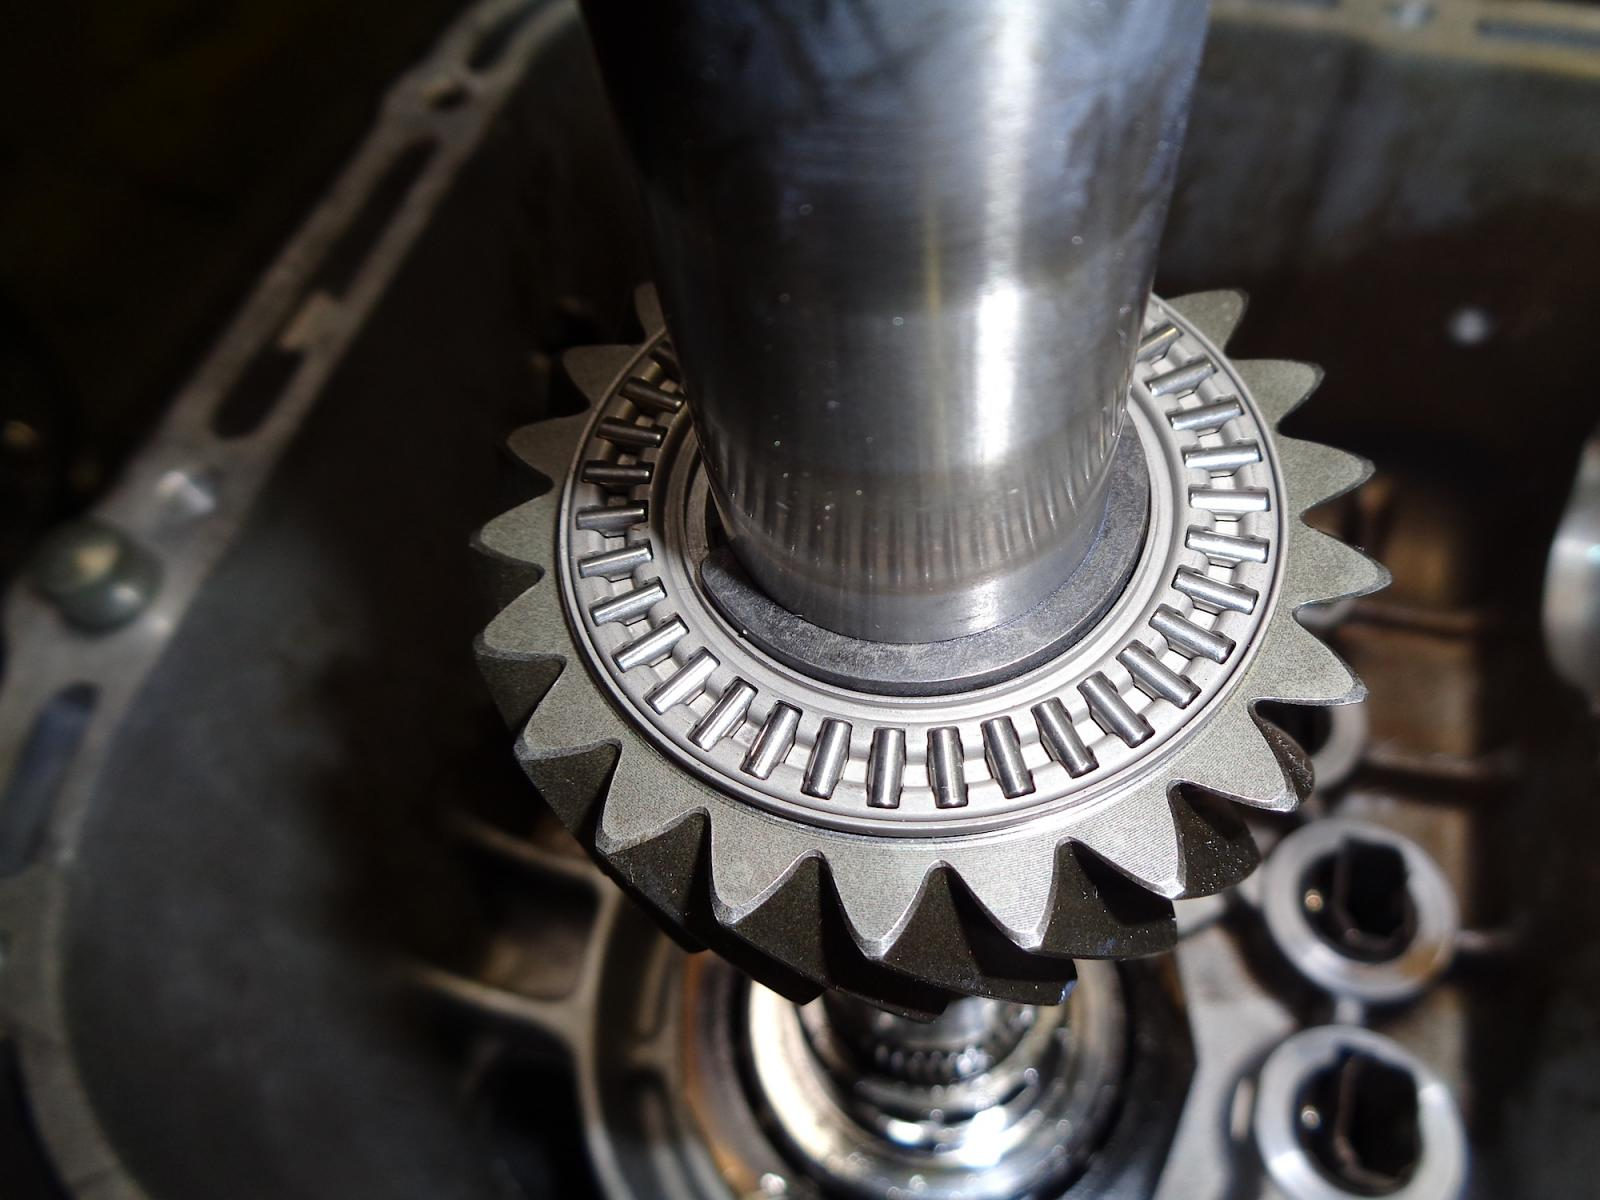 Pinion shaft thrust bearing